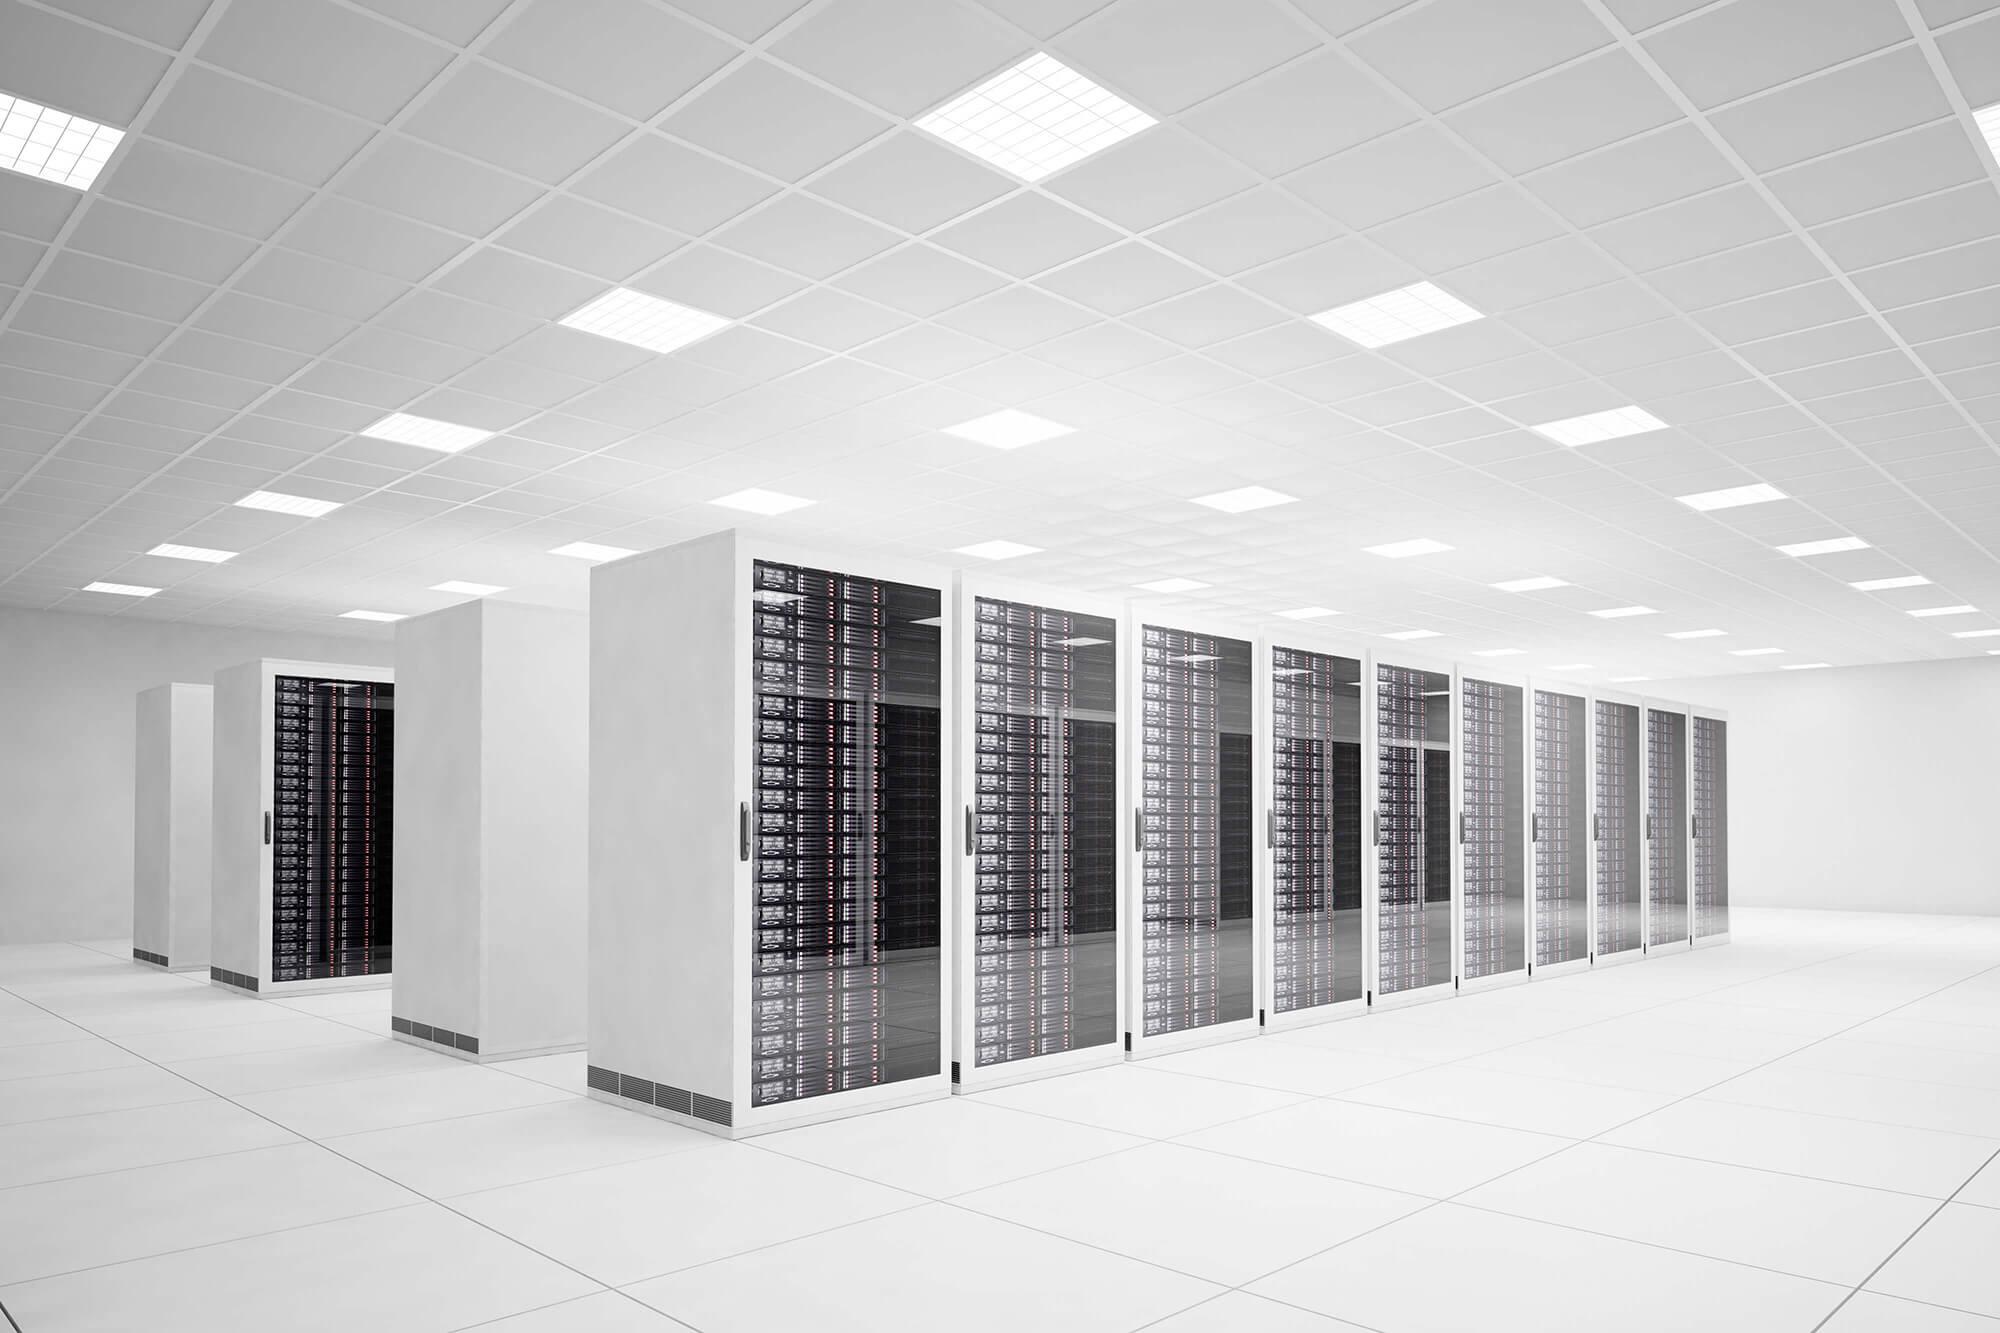 Data center of the future